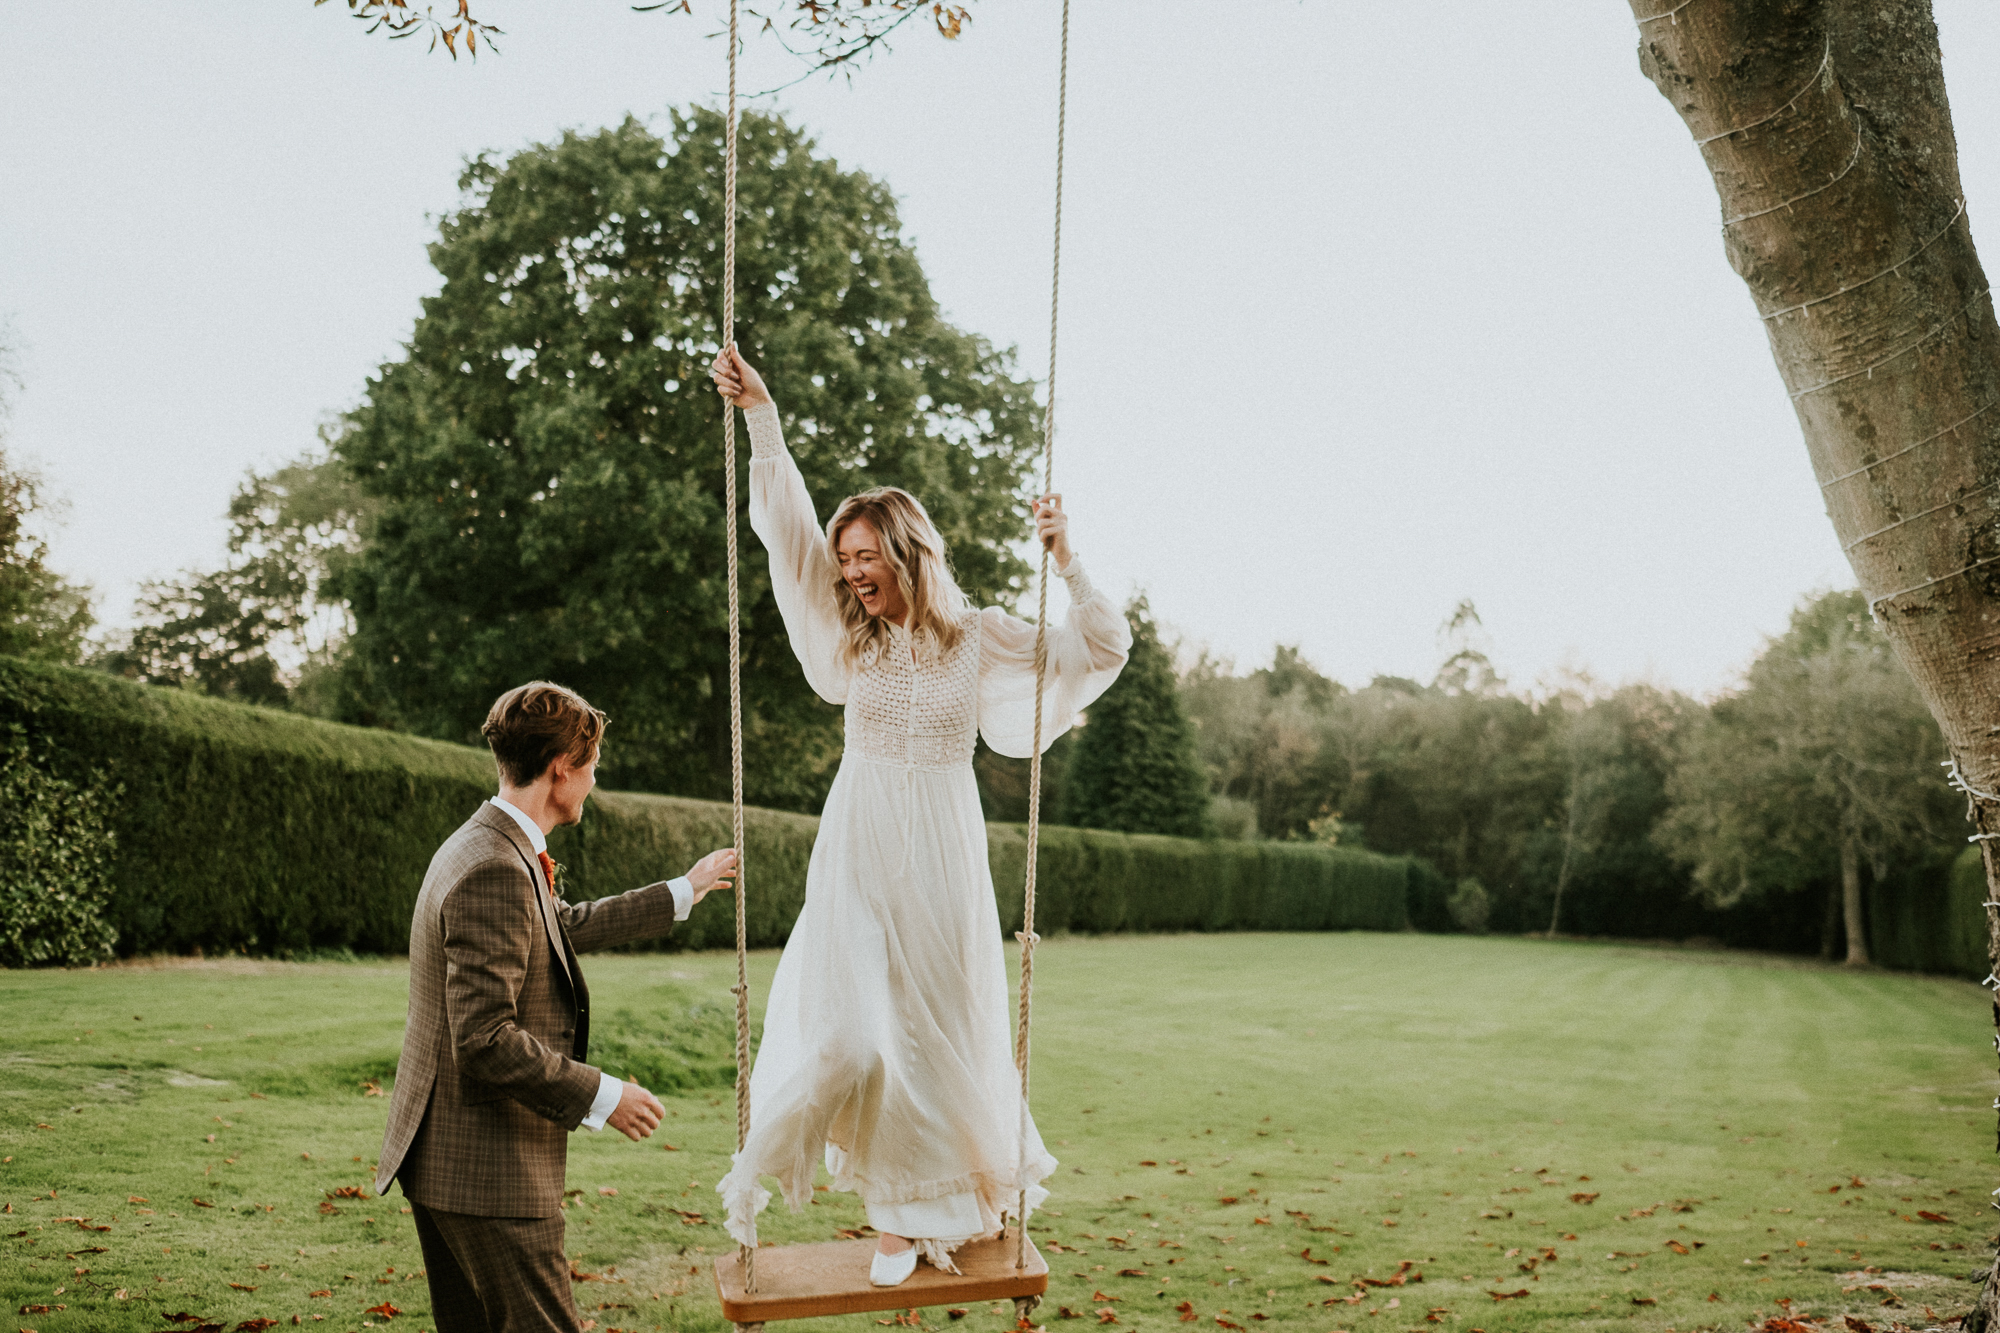 90 Cuckmere Haven Engagement shoot alternative wedding photographer Joanna Nicole Photography4.jpg